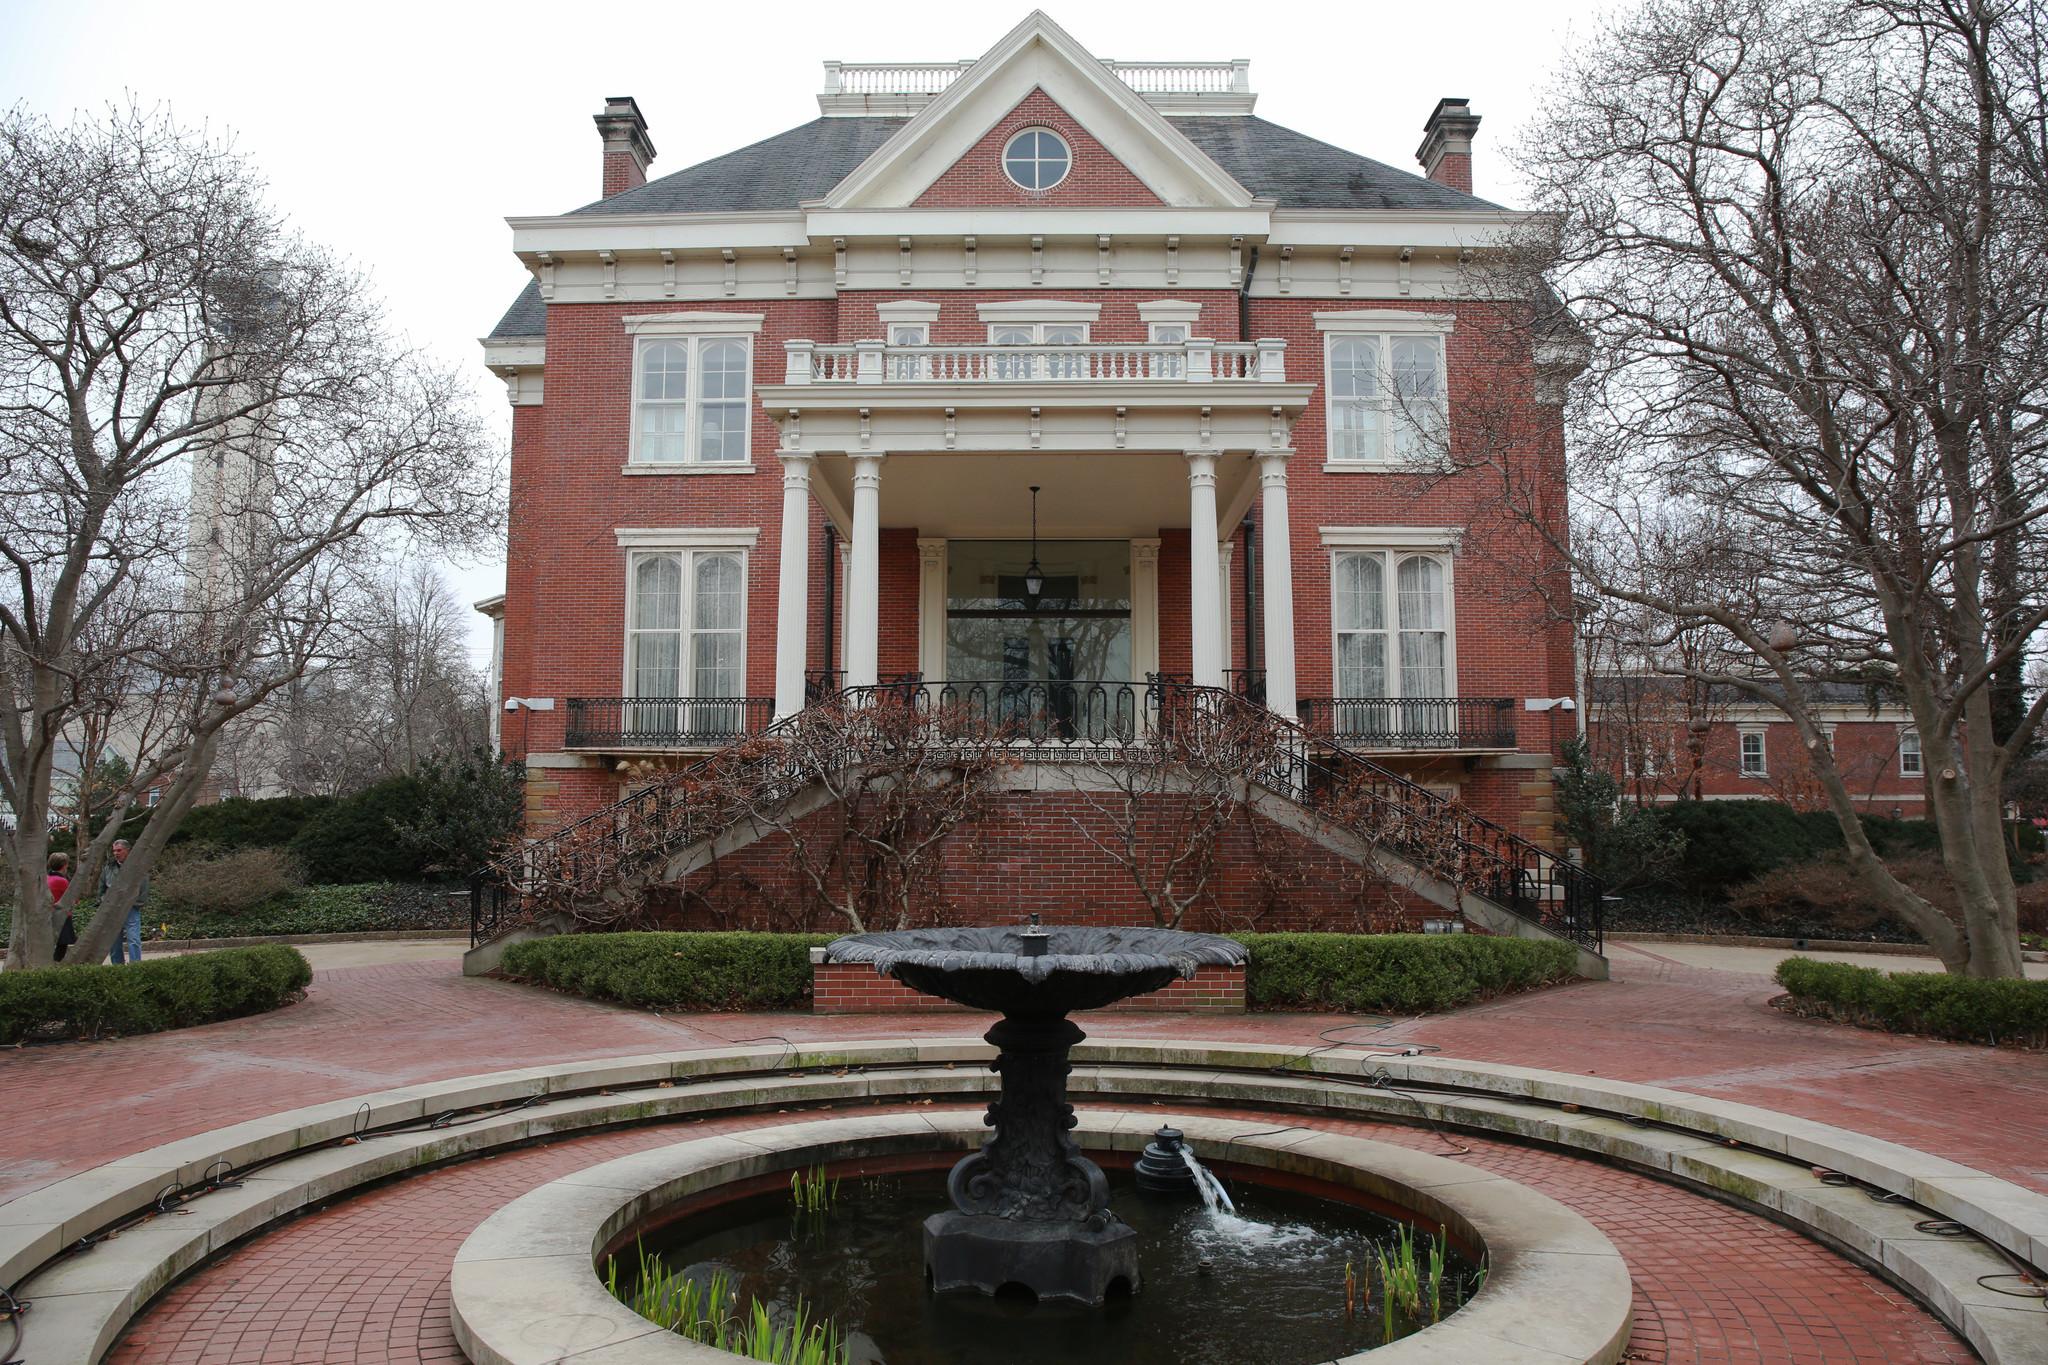 Group Renovating Governor S Mansion Seeking Design Firms